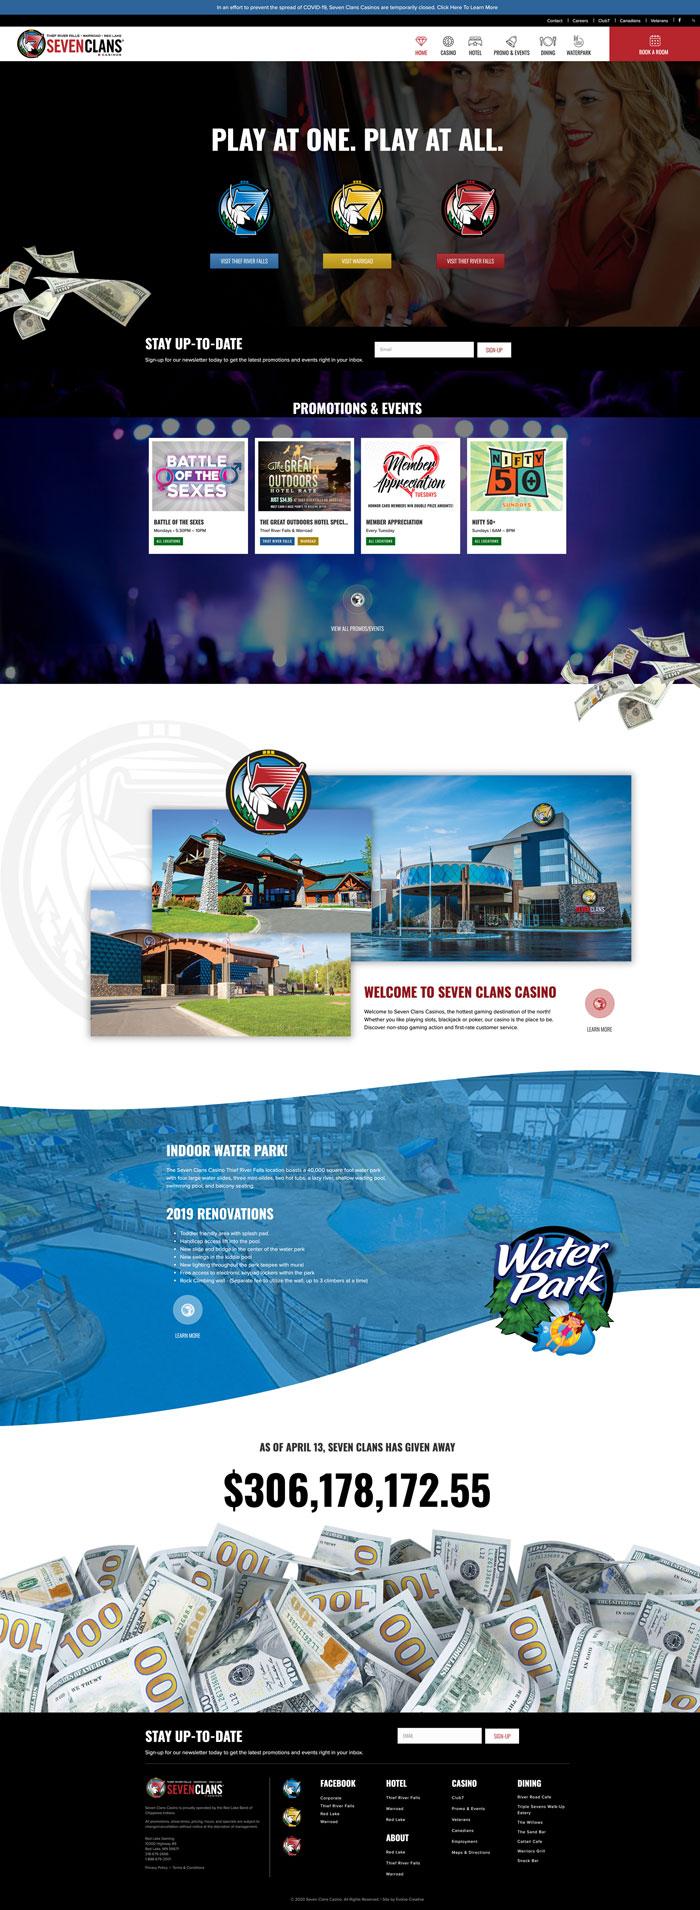 Seven Clans Casino website design